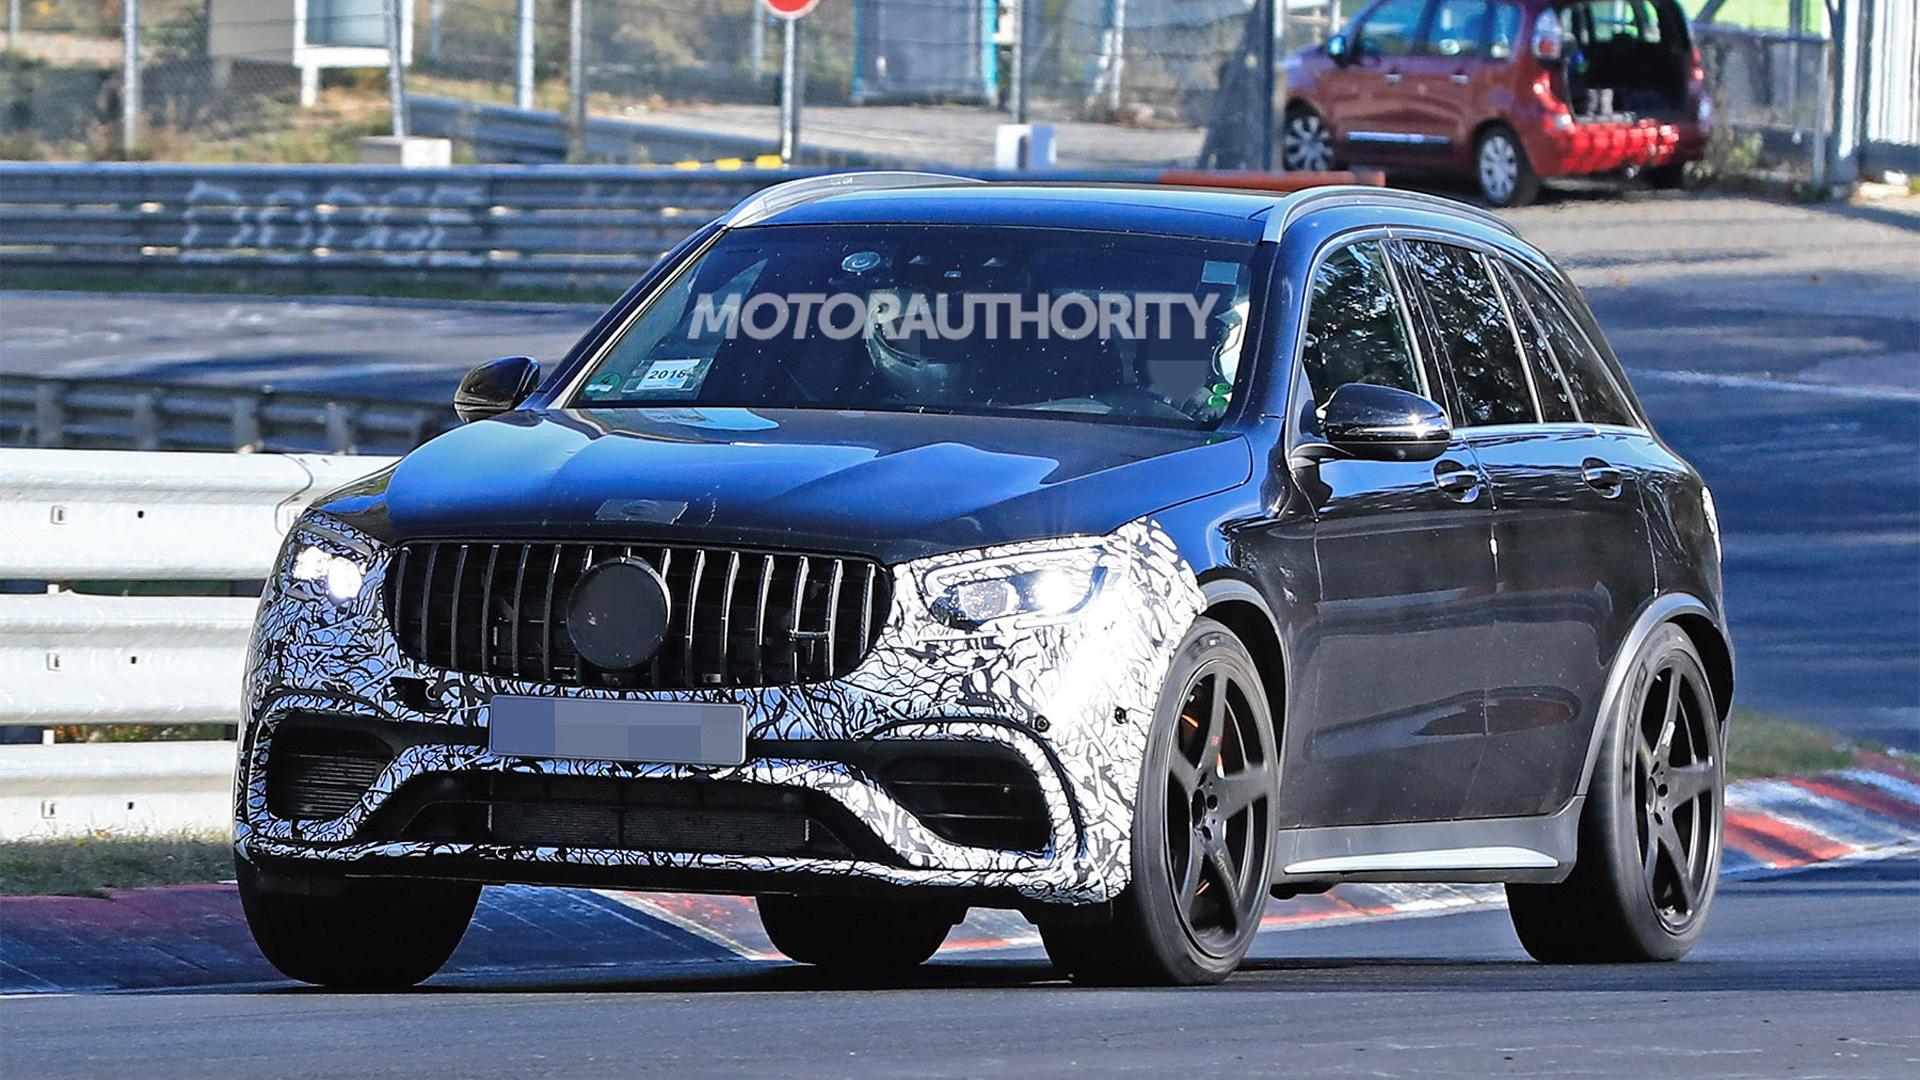 2020 Mercedes-AMG GLC63 facelift spy shots - Image via S. Baldauf/SB-Medien